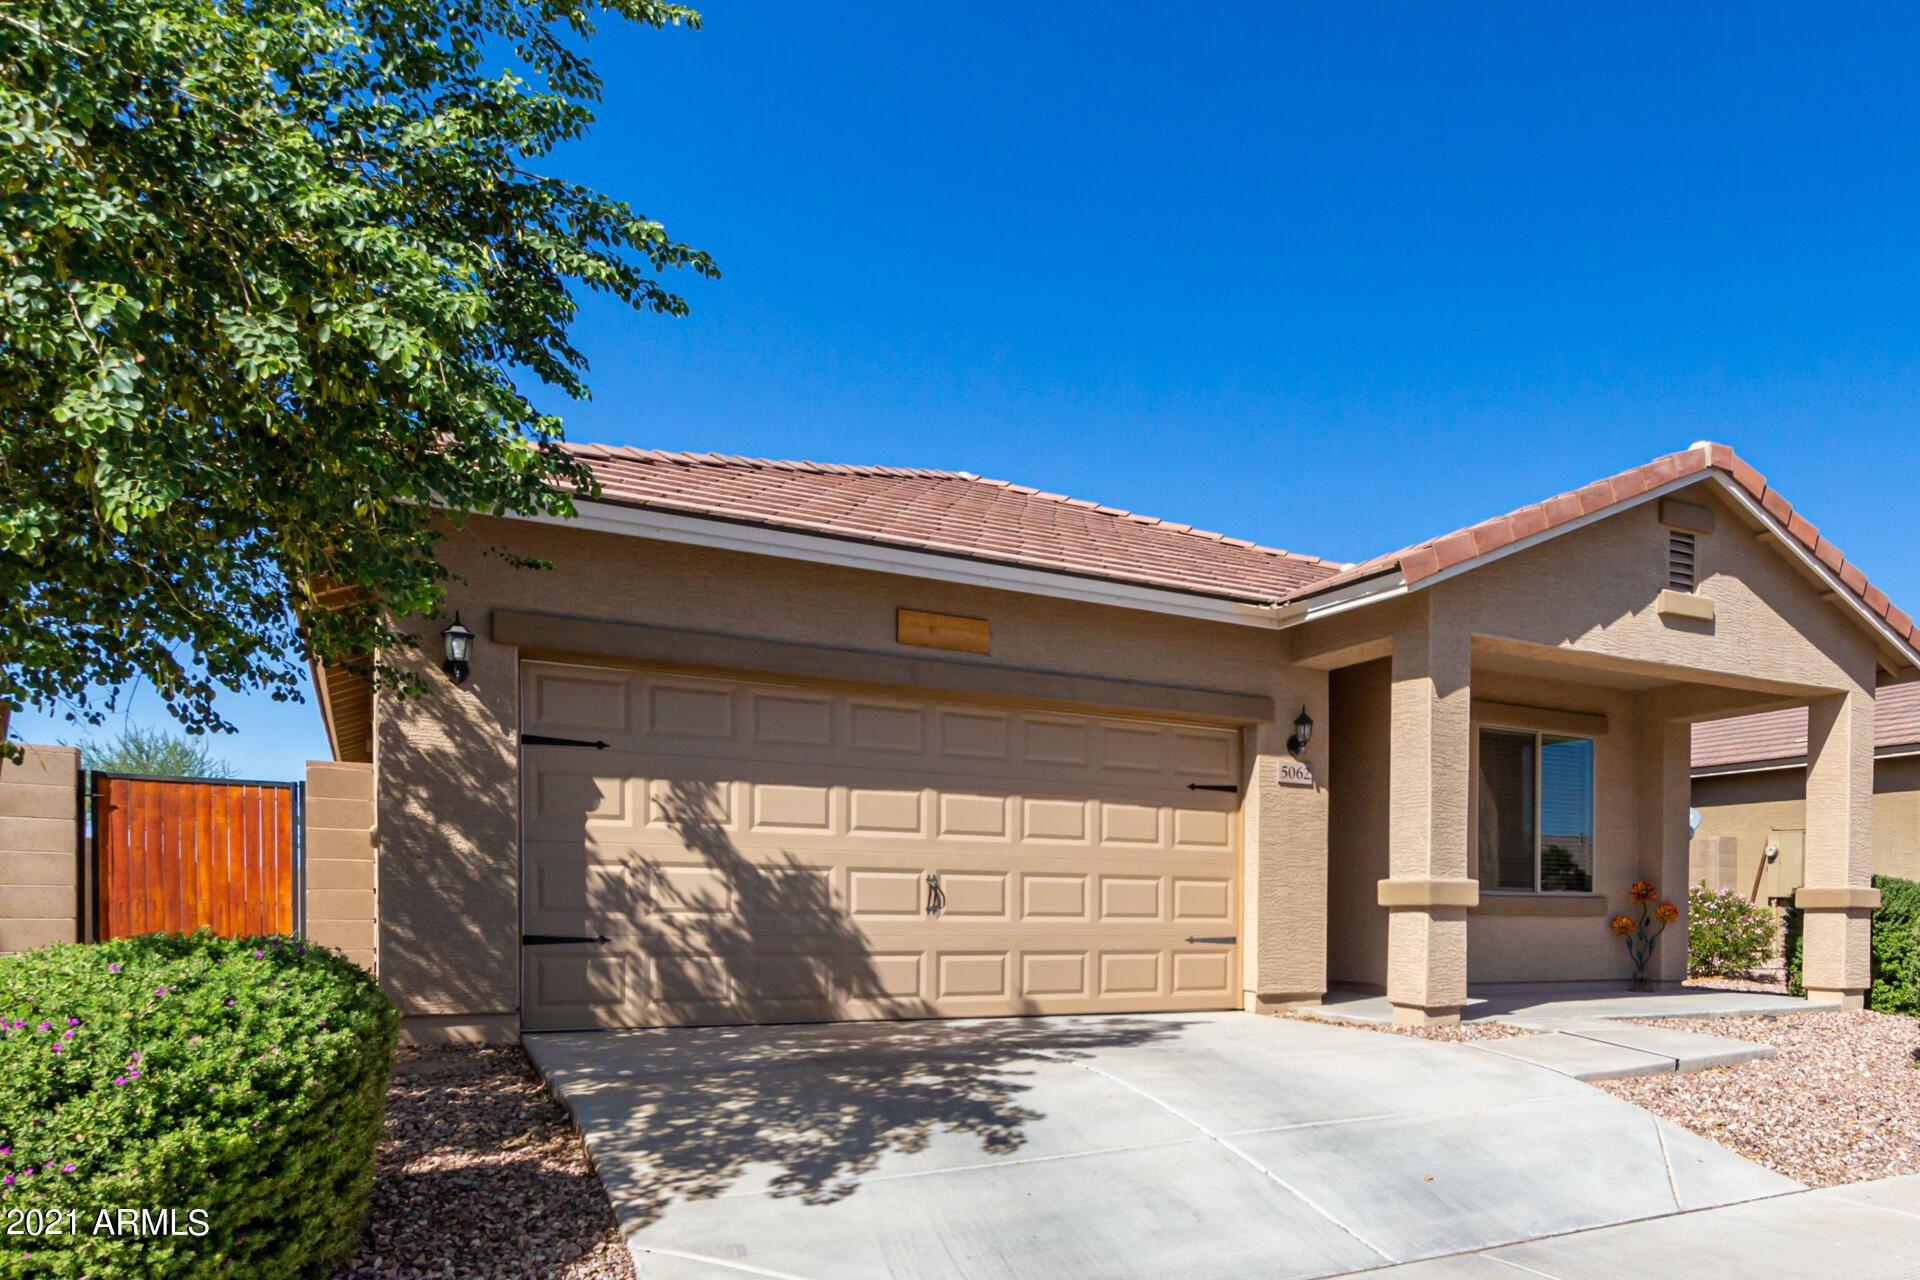 Photo of 5062 S 246th Lane, Buckeye, AZ 85326 (MLS # 6307827)